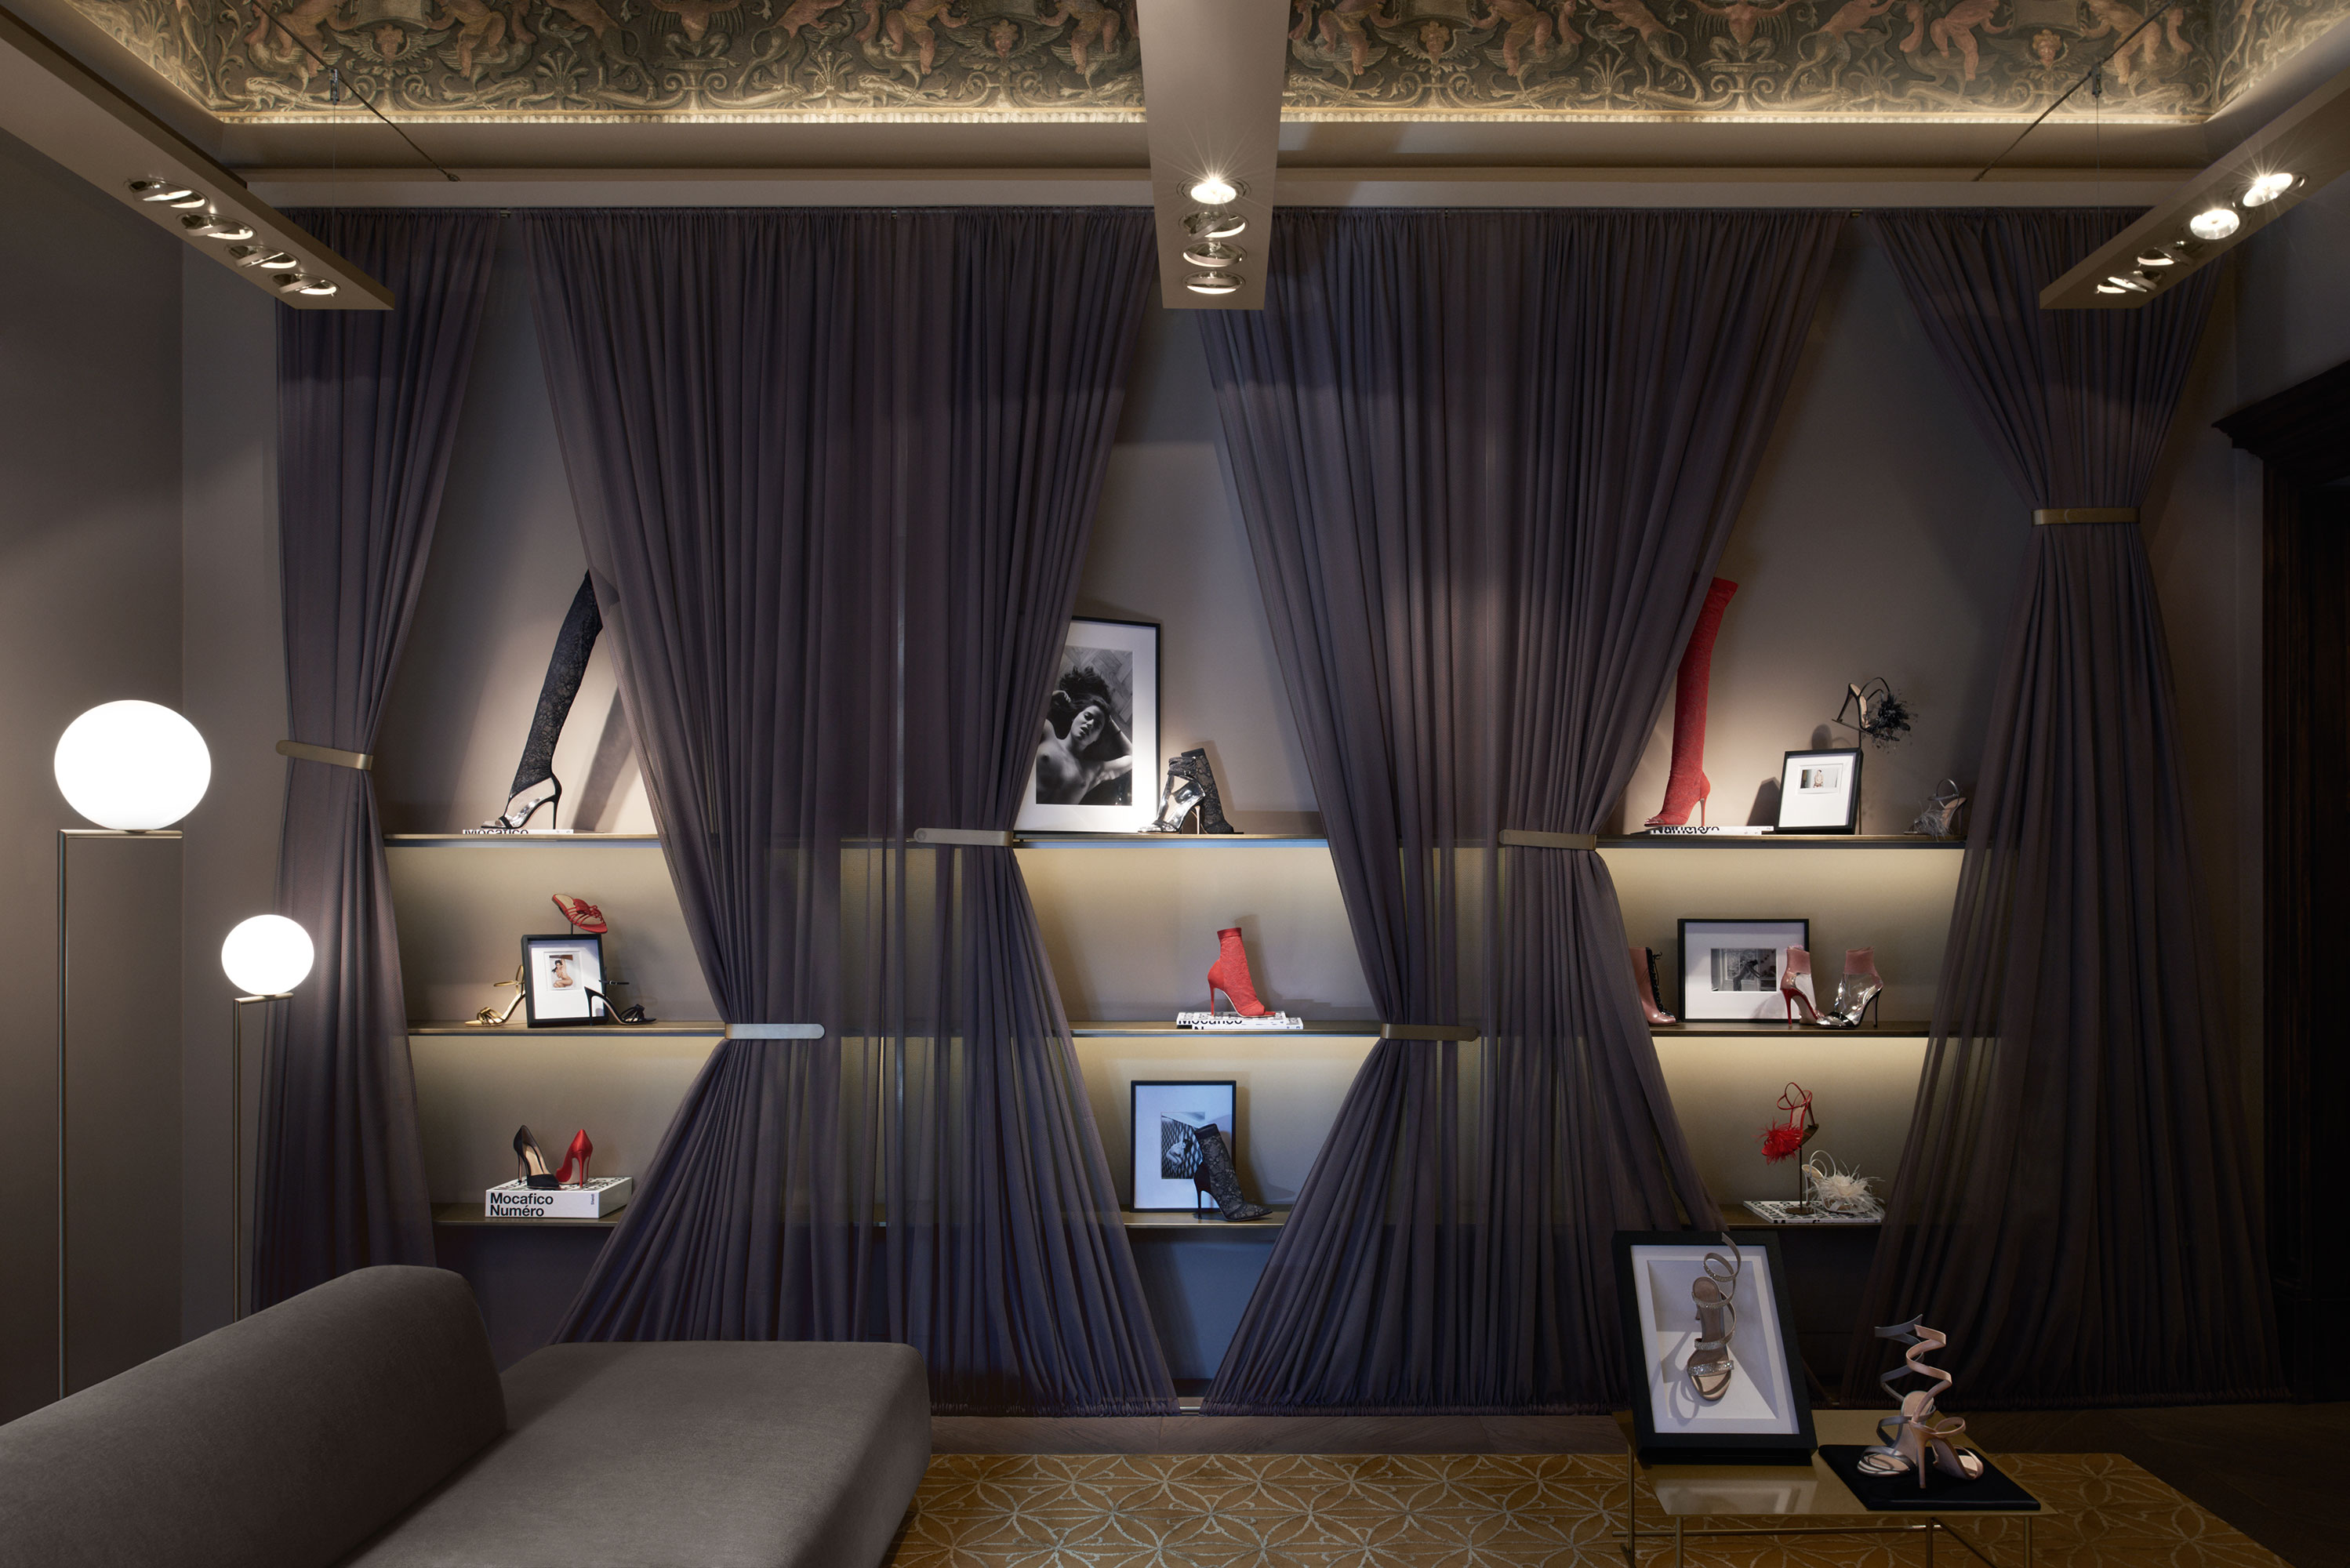 Gianvito Rossi boutique in Milan 2018 | Paola Pansini | gianvito rossi | Numerique Retouch Photo Retouching Studio